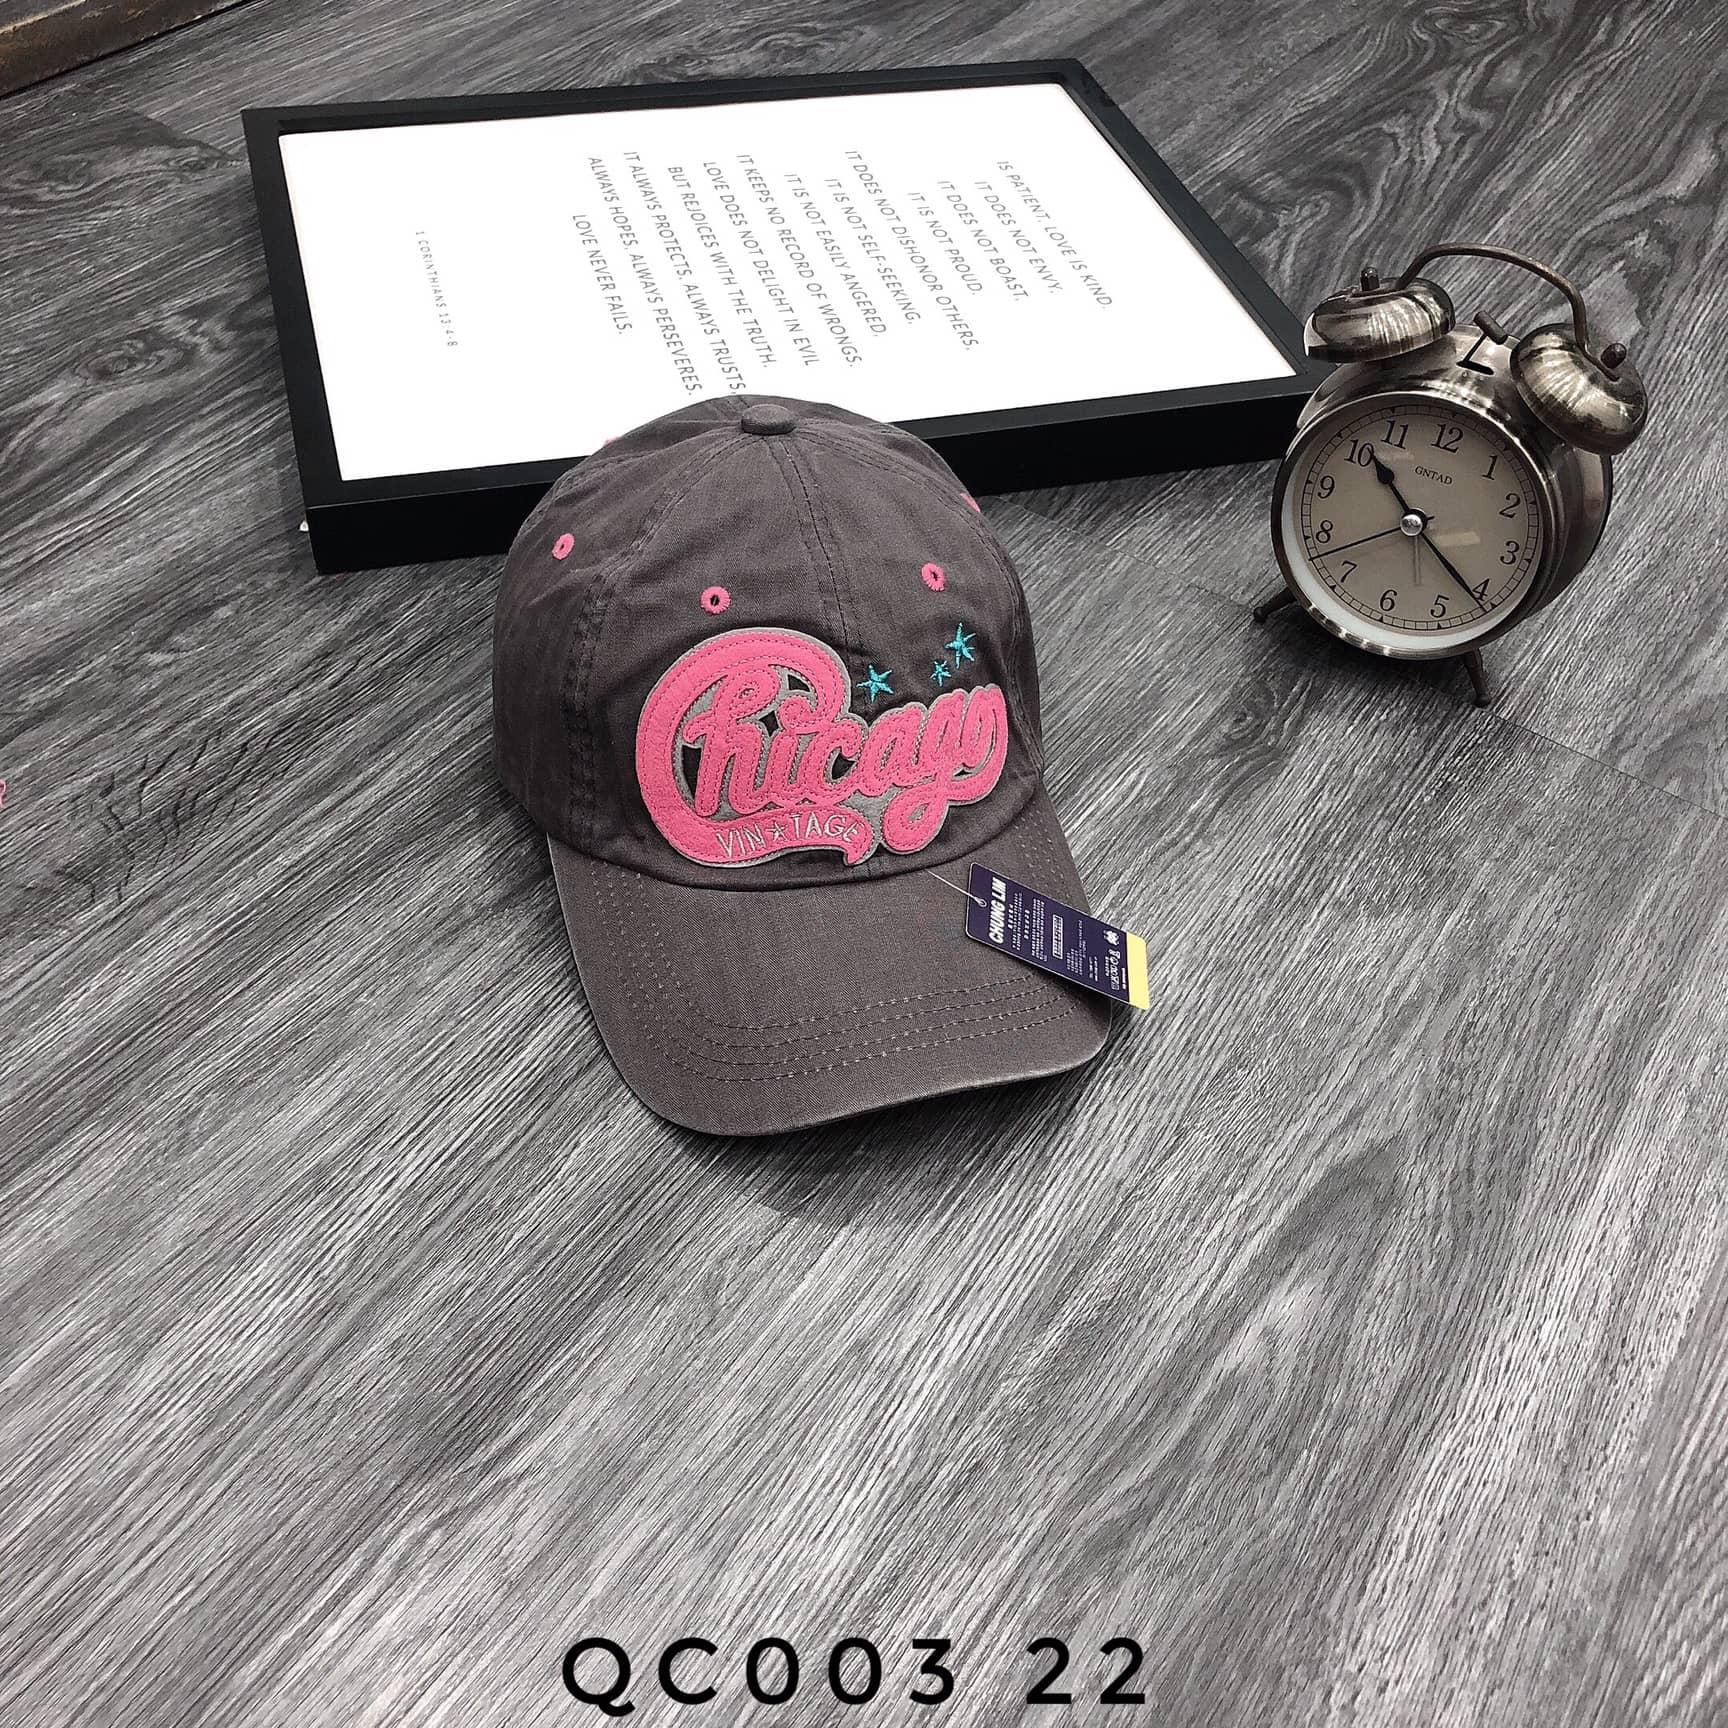 NÓN QC003